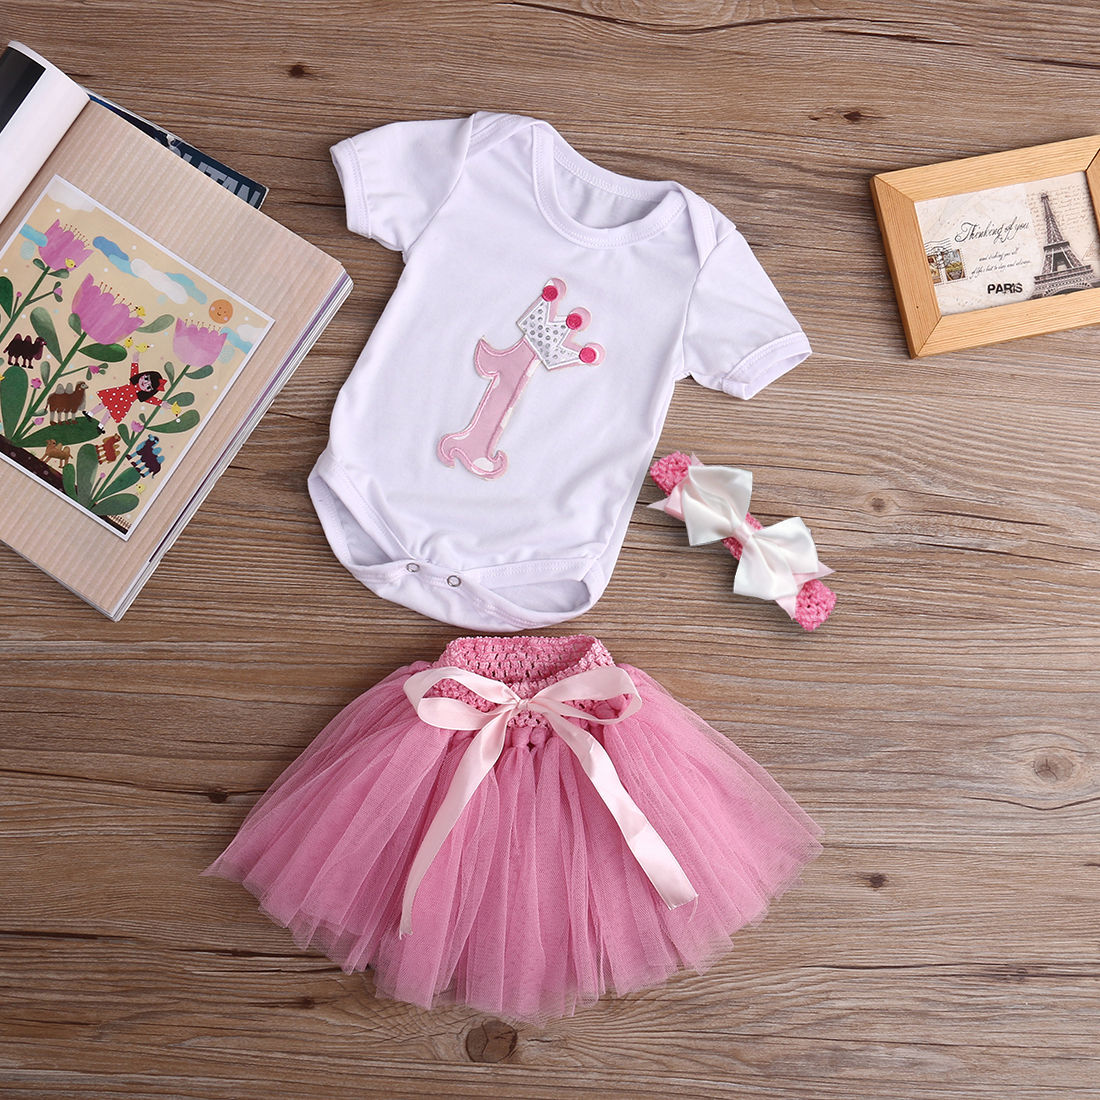 4989b8095cd9 Baby Girl 1st Birthday Tutu Outfits